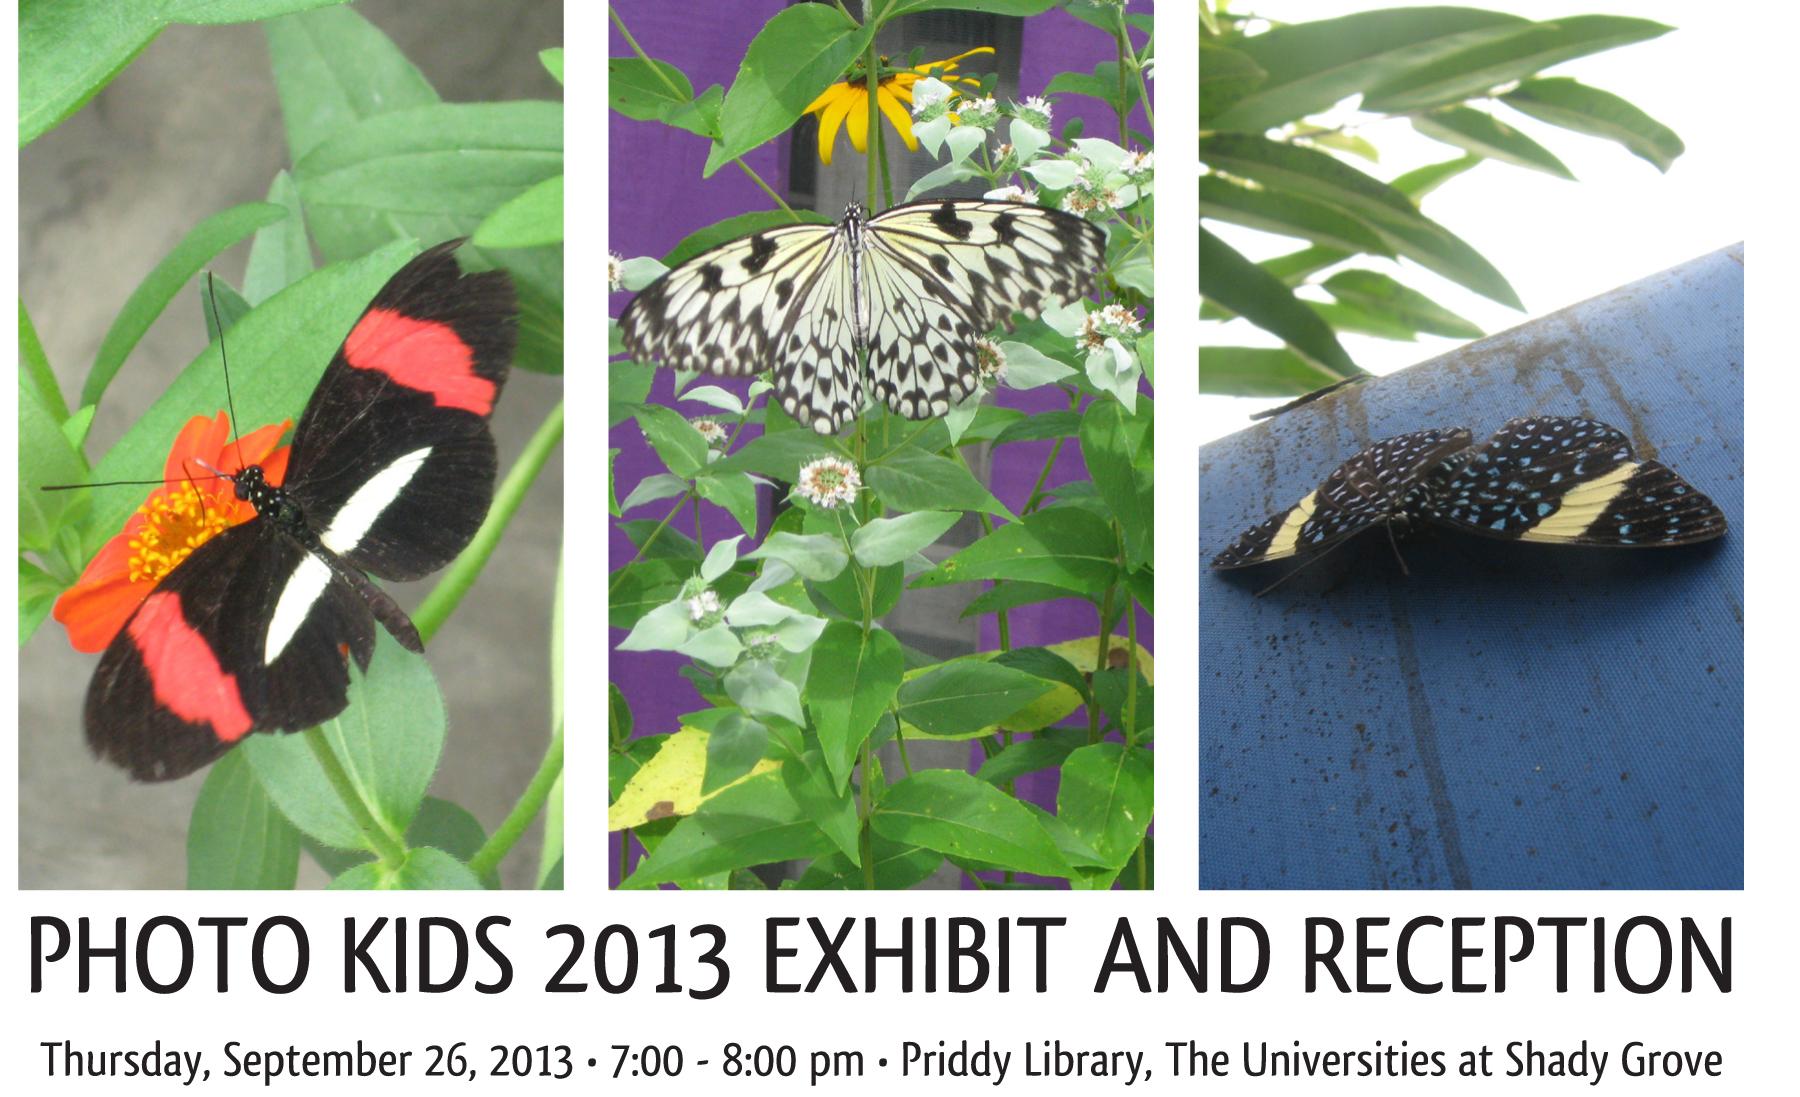 PhotoKids Postcard_2013-1.jpg